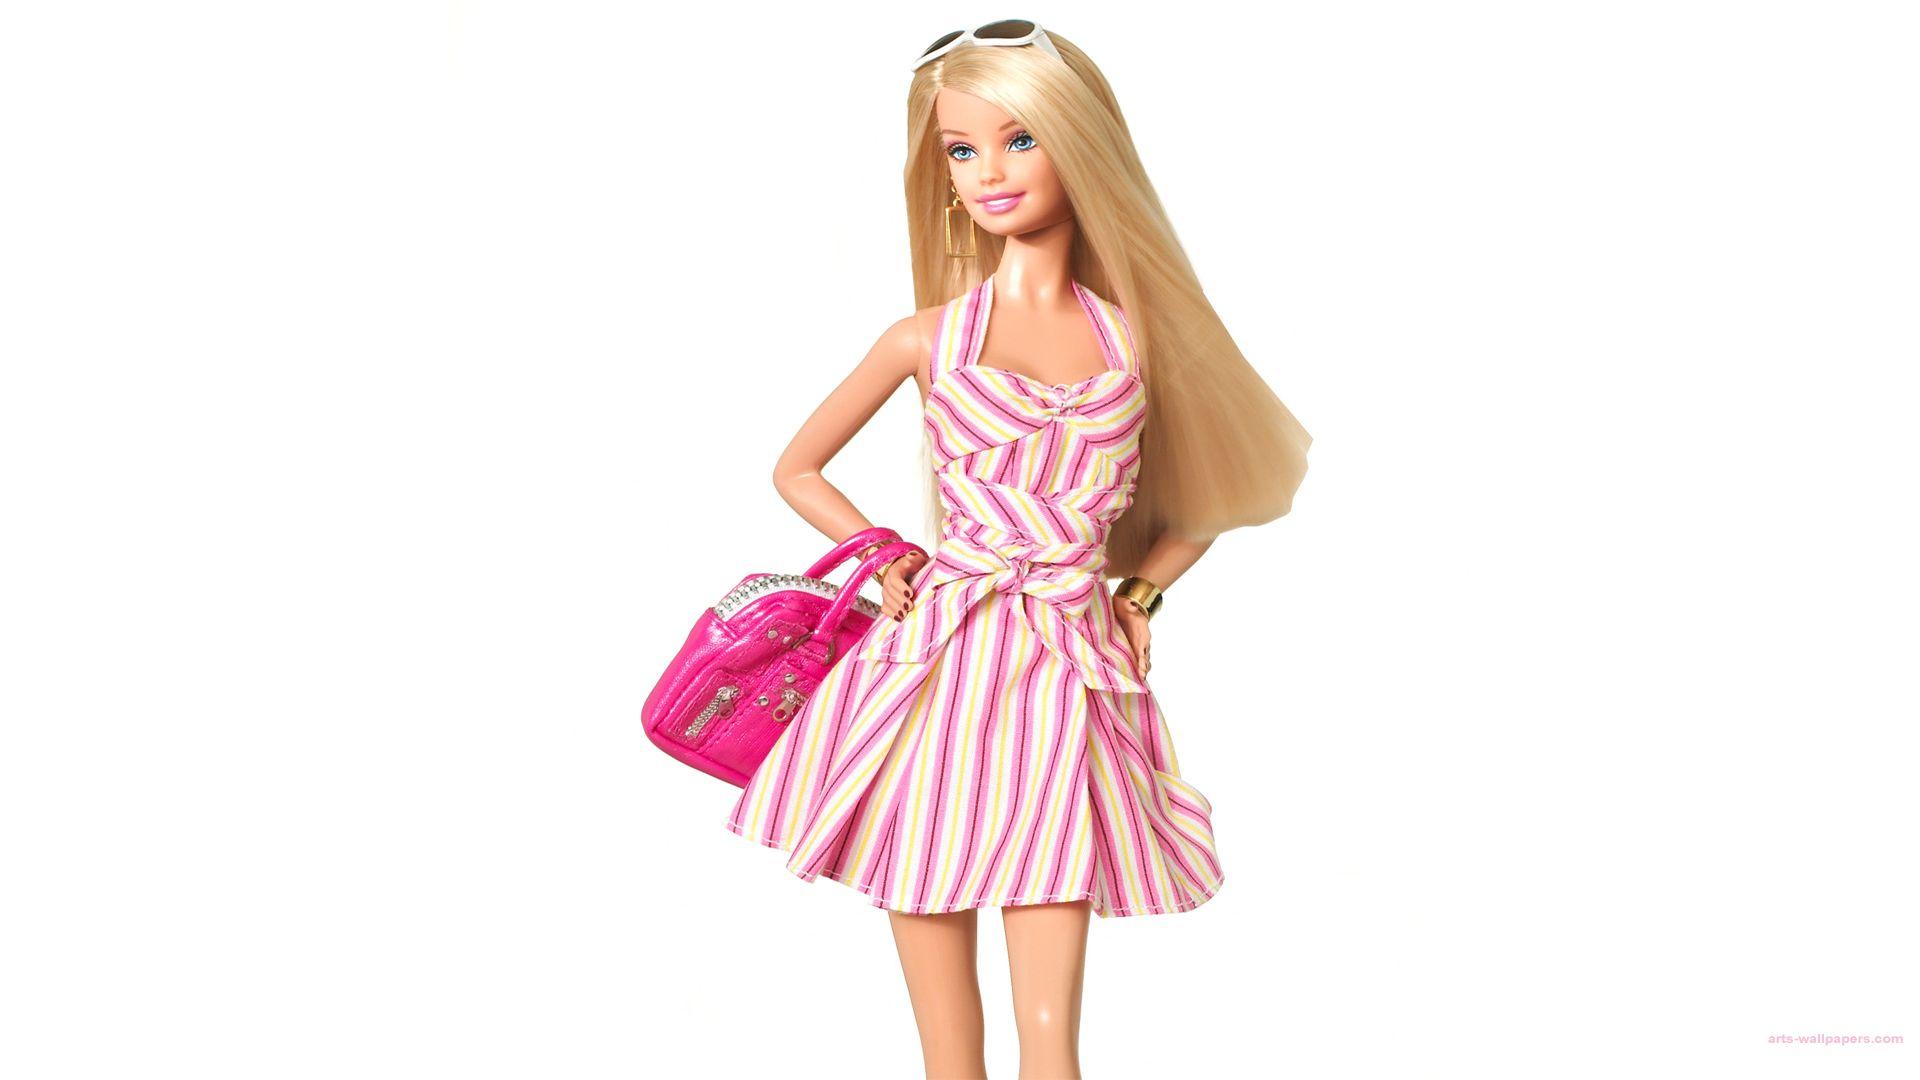 Barbie cartoon barbie art childrens animated hd wallpapers barbie cartoon barbie art childrens animated hd wallpapers voltagebd Image collections